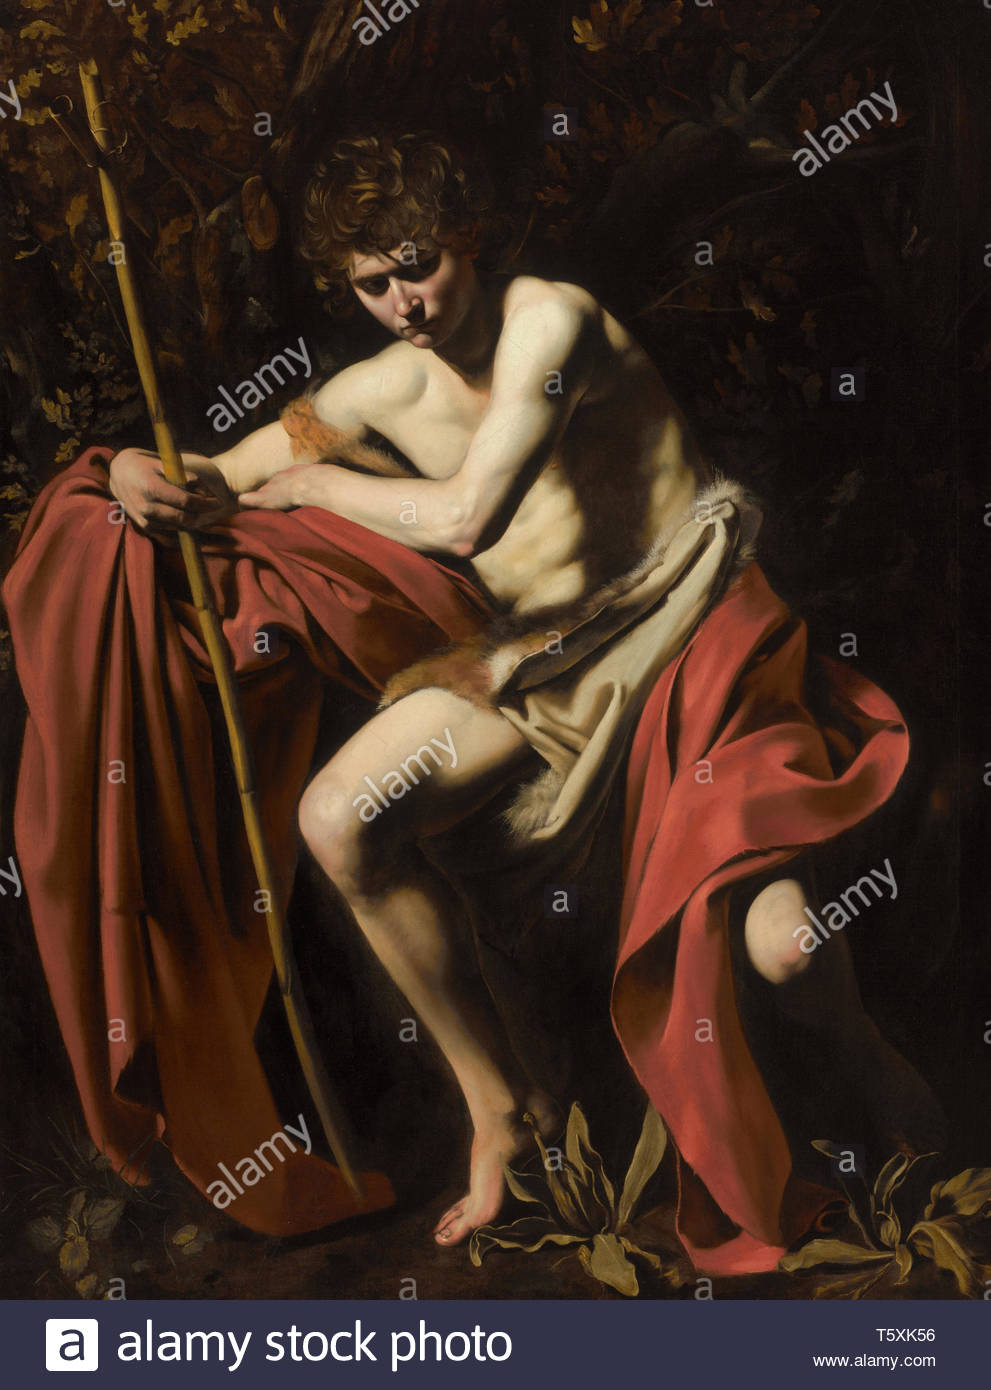 Michelangelo Merisi (Caravaggio)-Saint John the Baptist in the Wilderness, 1604-1605 - Stock Image